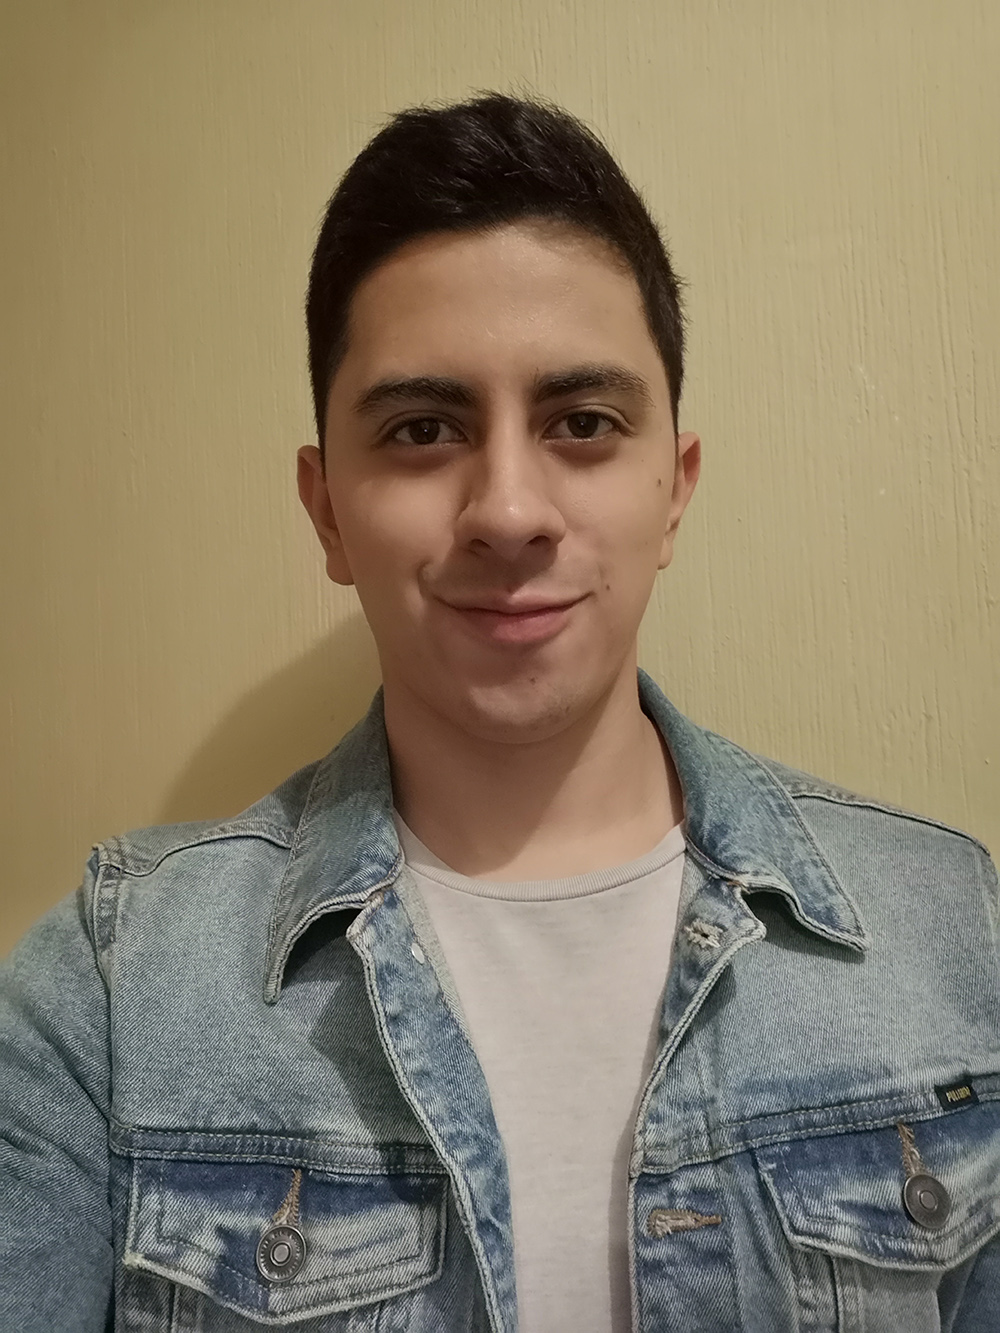 Guillermo Peralta Albizures